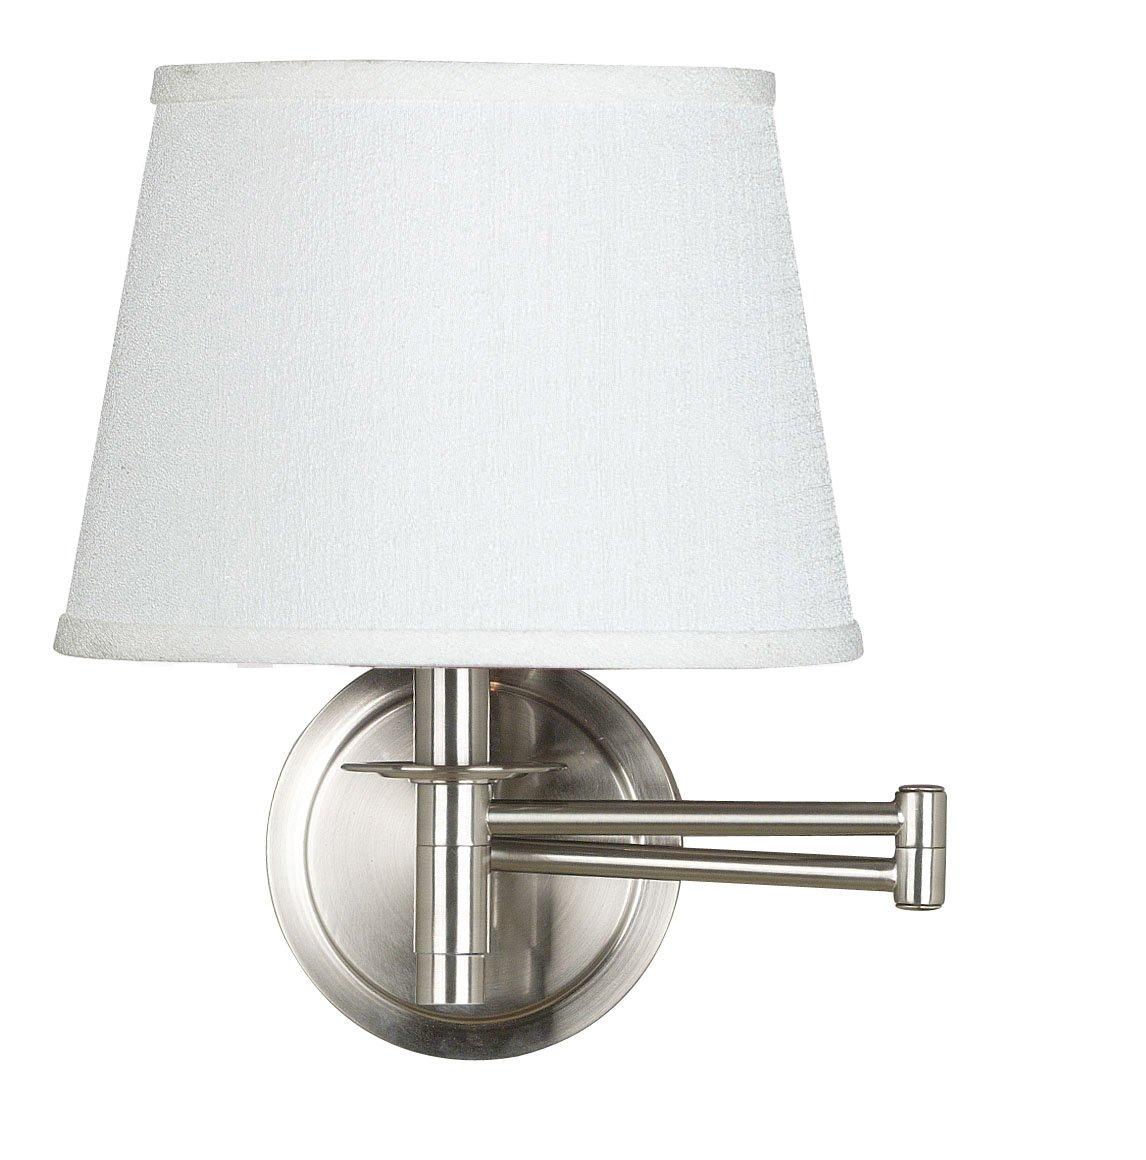 Kenroy Home 21011BS Sheppard Wall Swing Arm Lamp, Brushed Steel